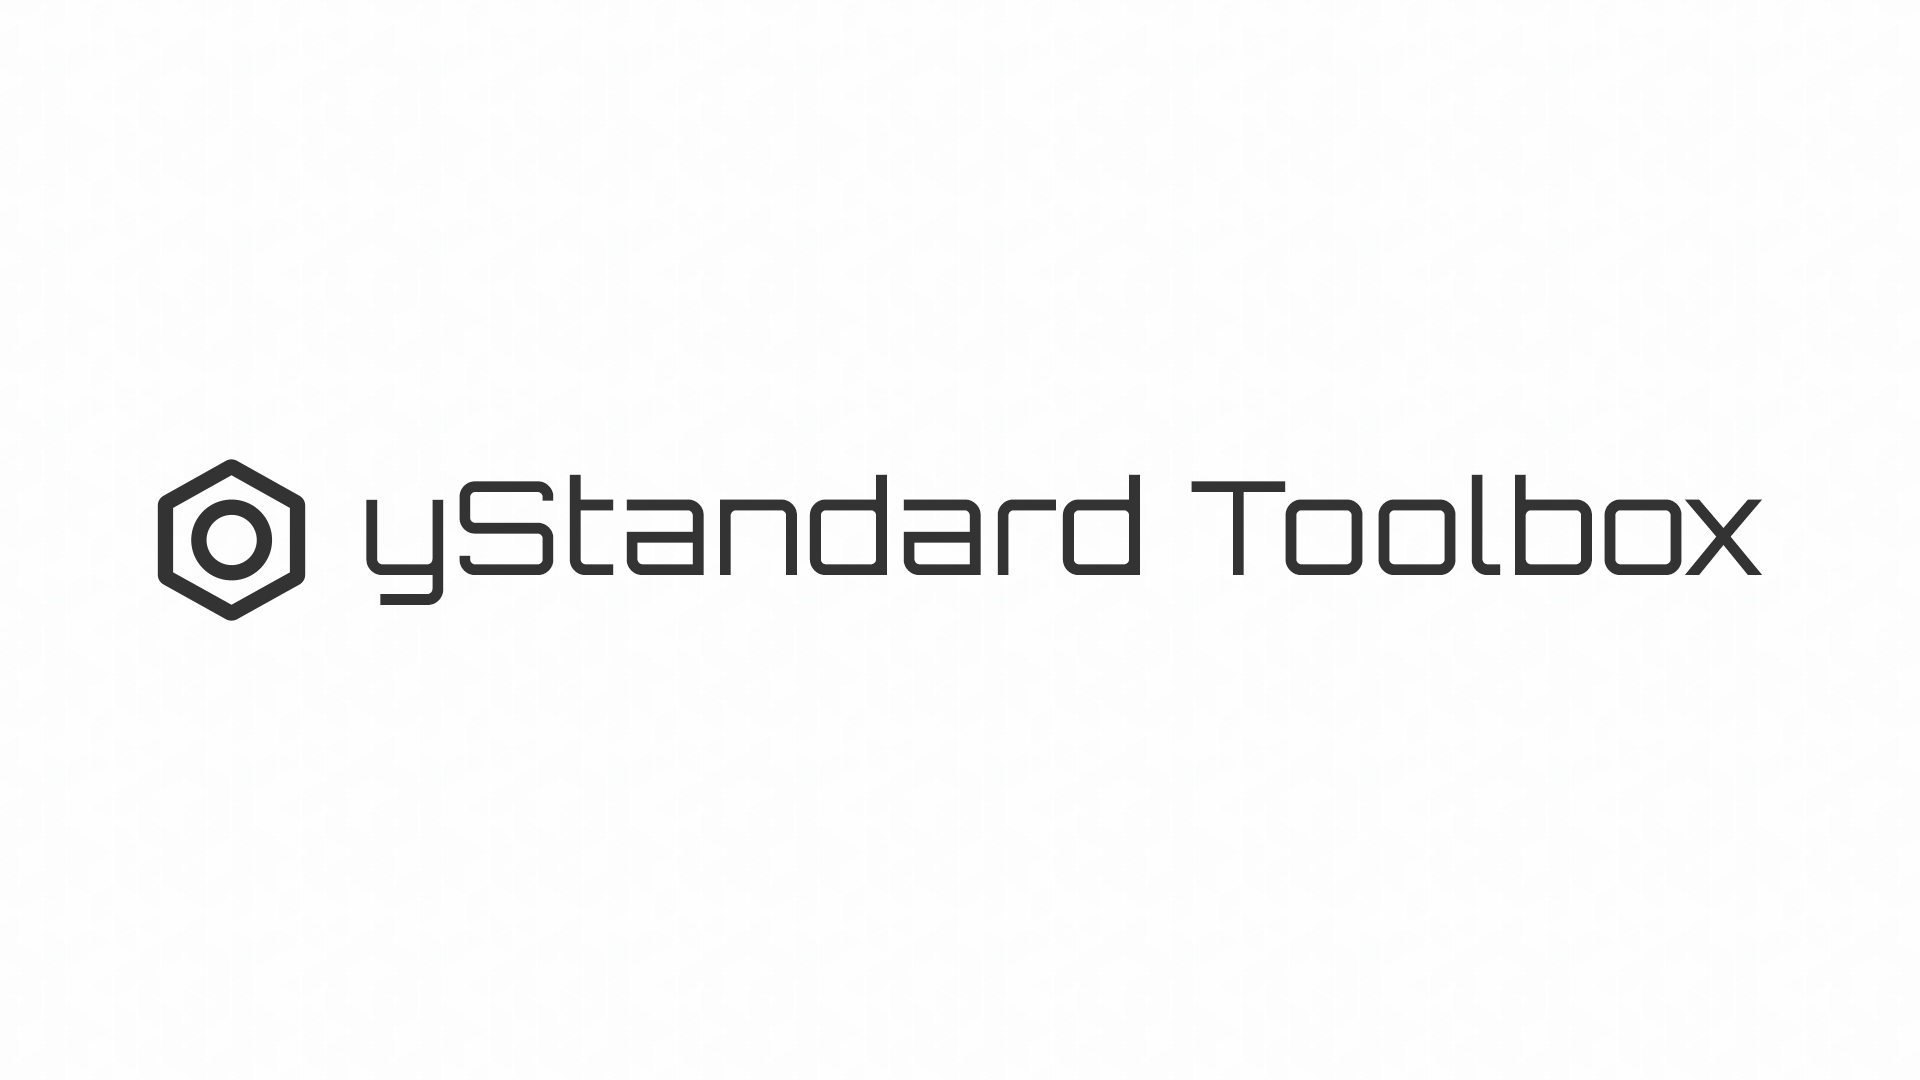 【yStandard Toolbox v1.9.0】モバイルメニュー用ウィジェット機能追加、WordPress 5.7対応等